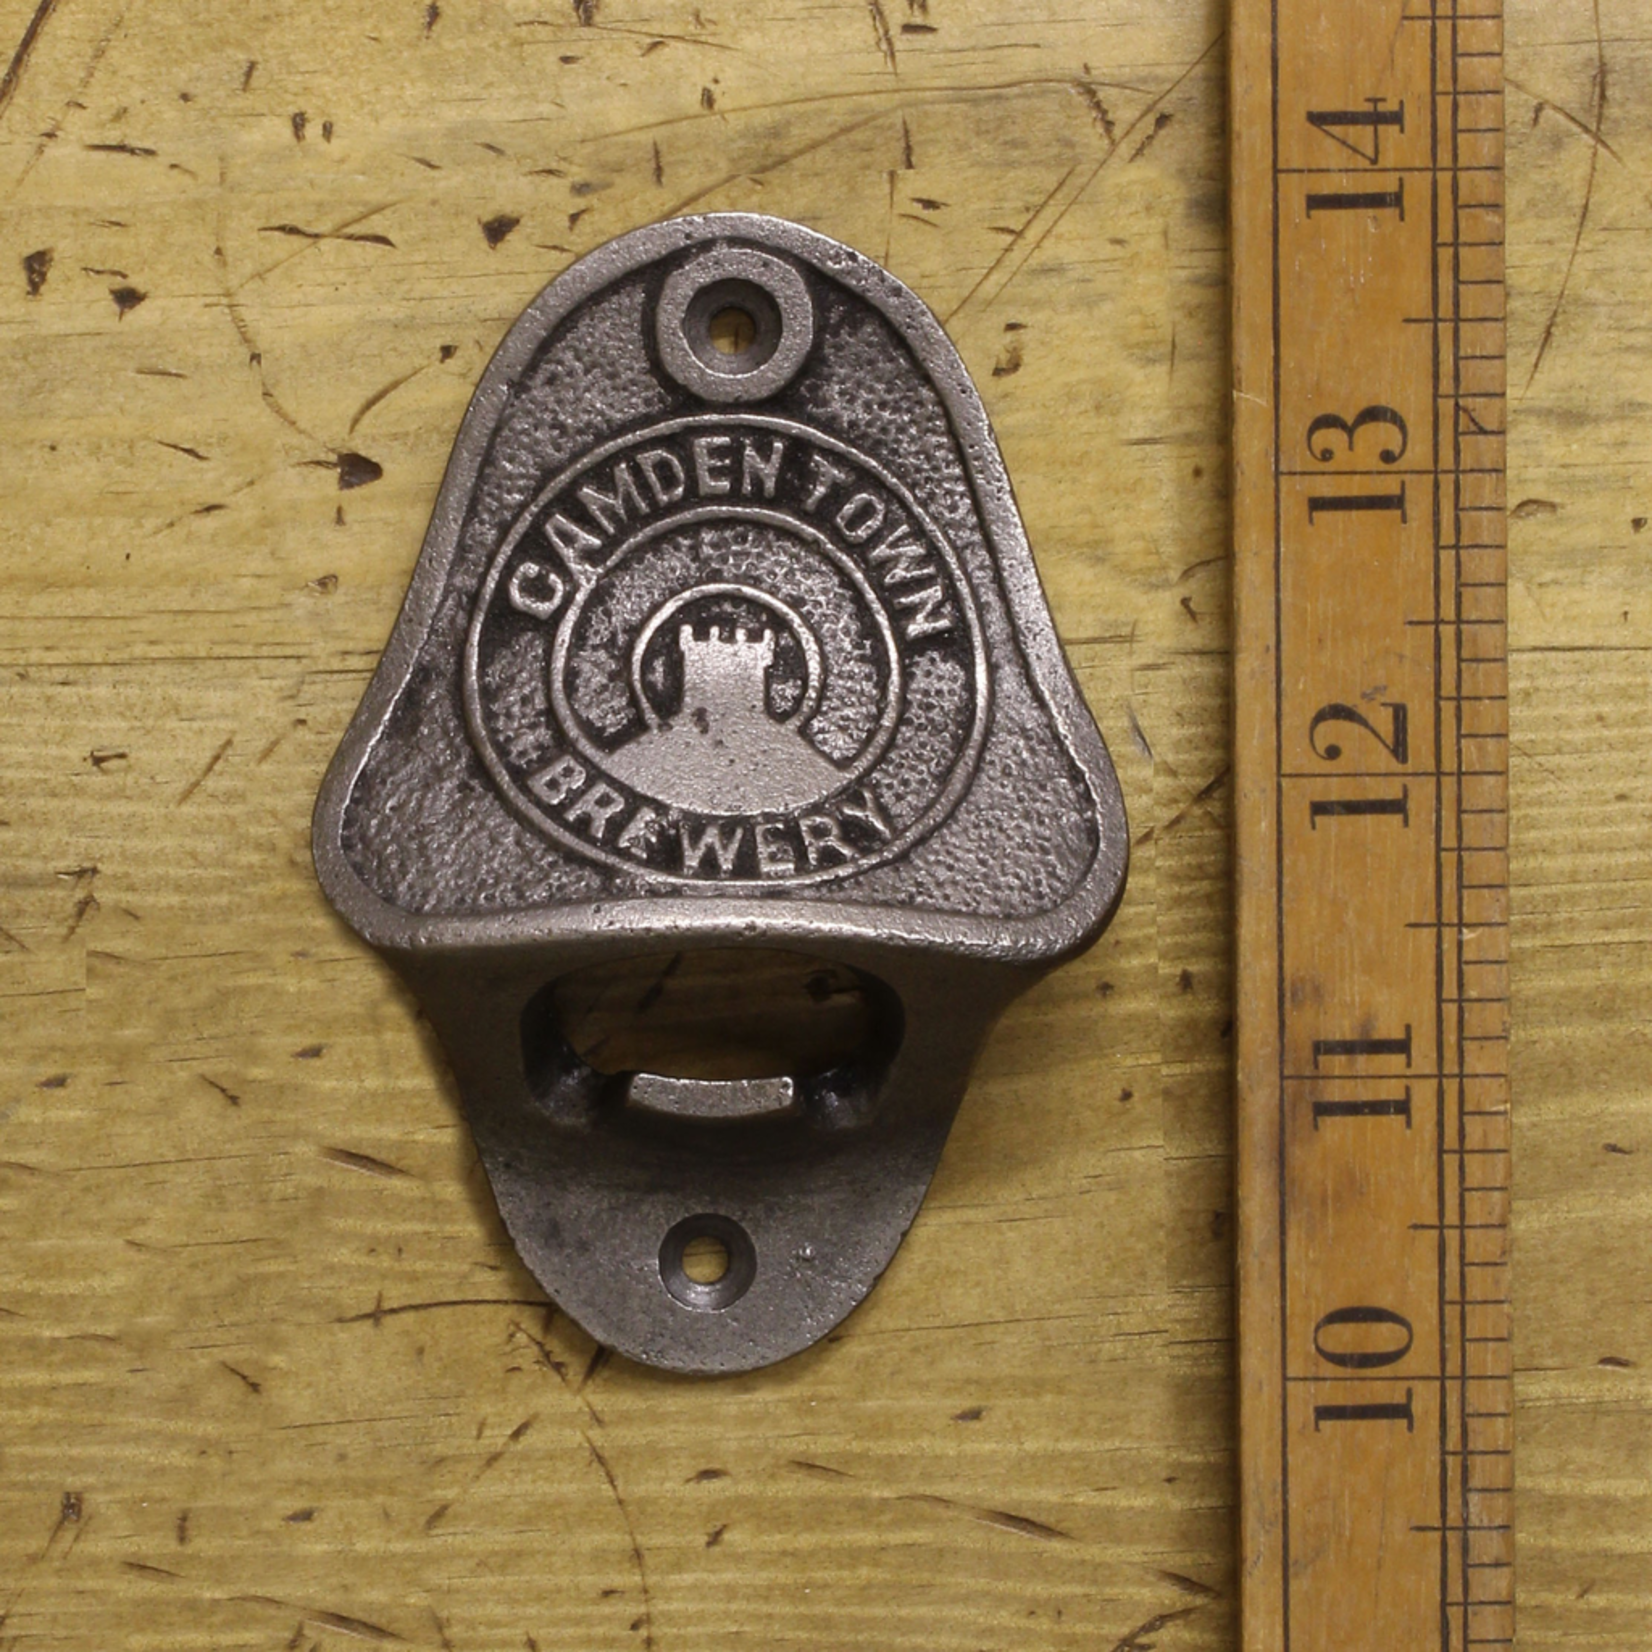 IRON RANGE Bottle Opener Wall Mounted CAMDEN TOWN Cast Iron